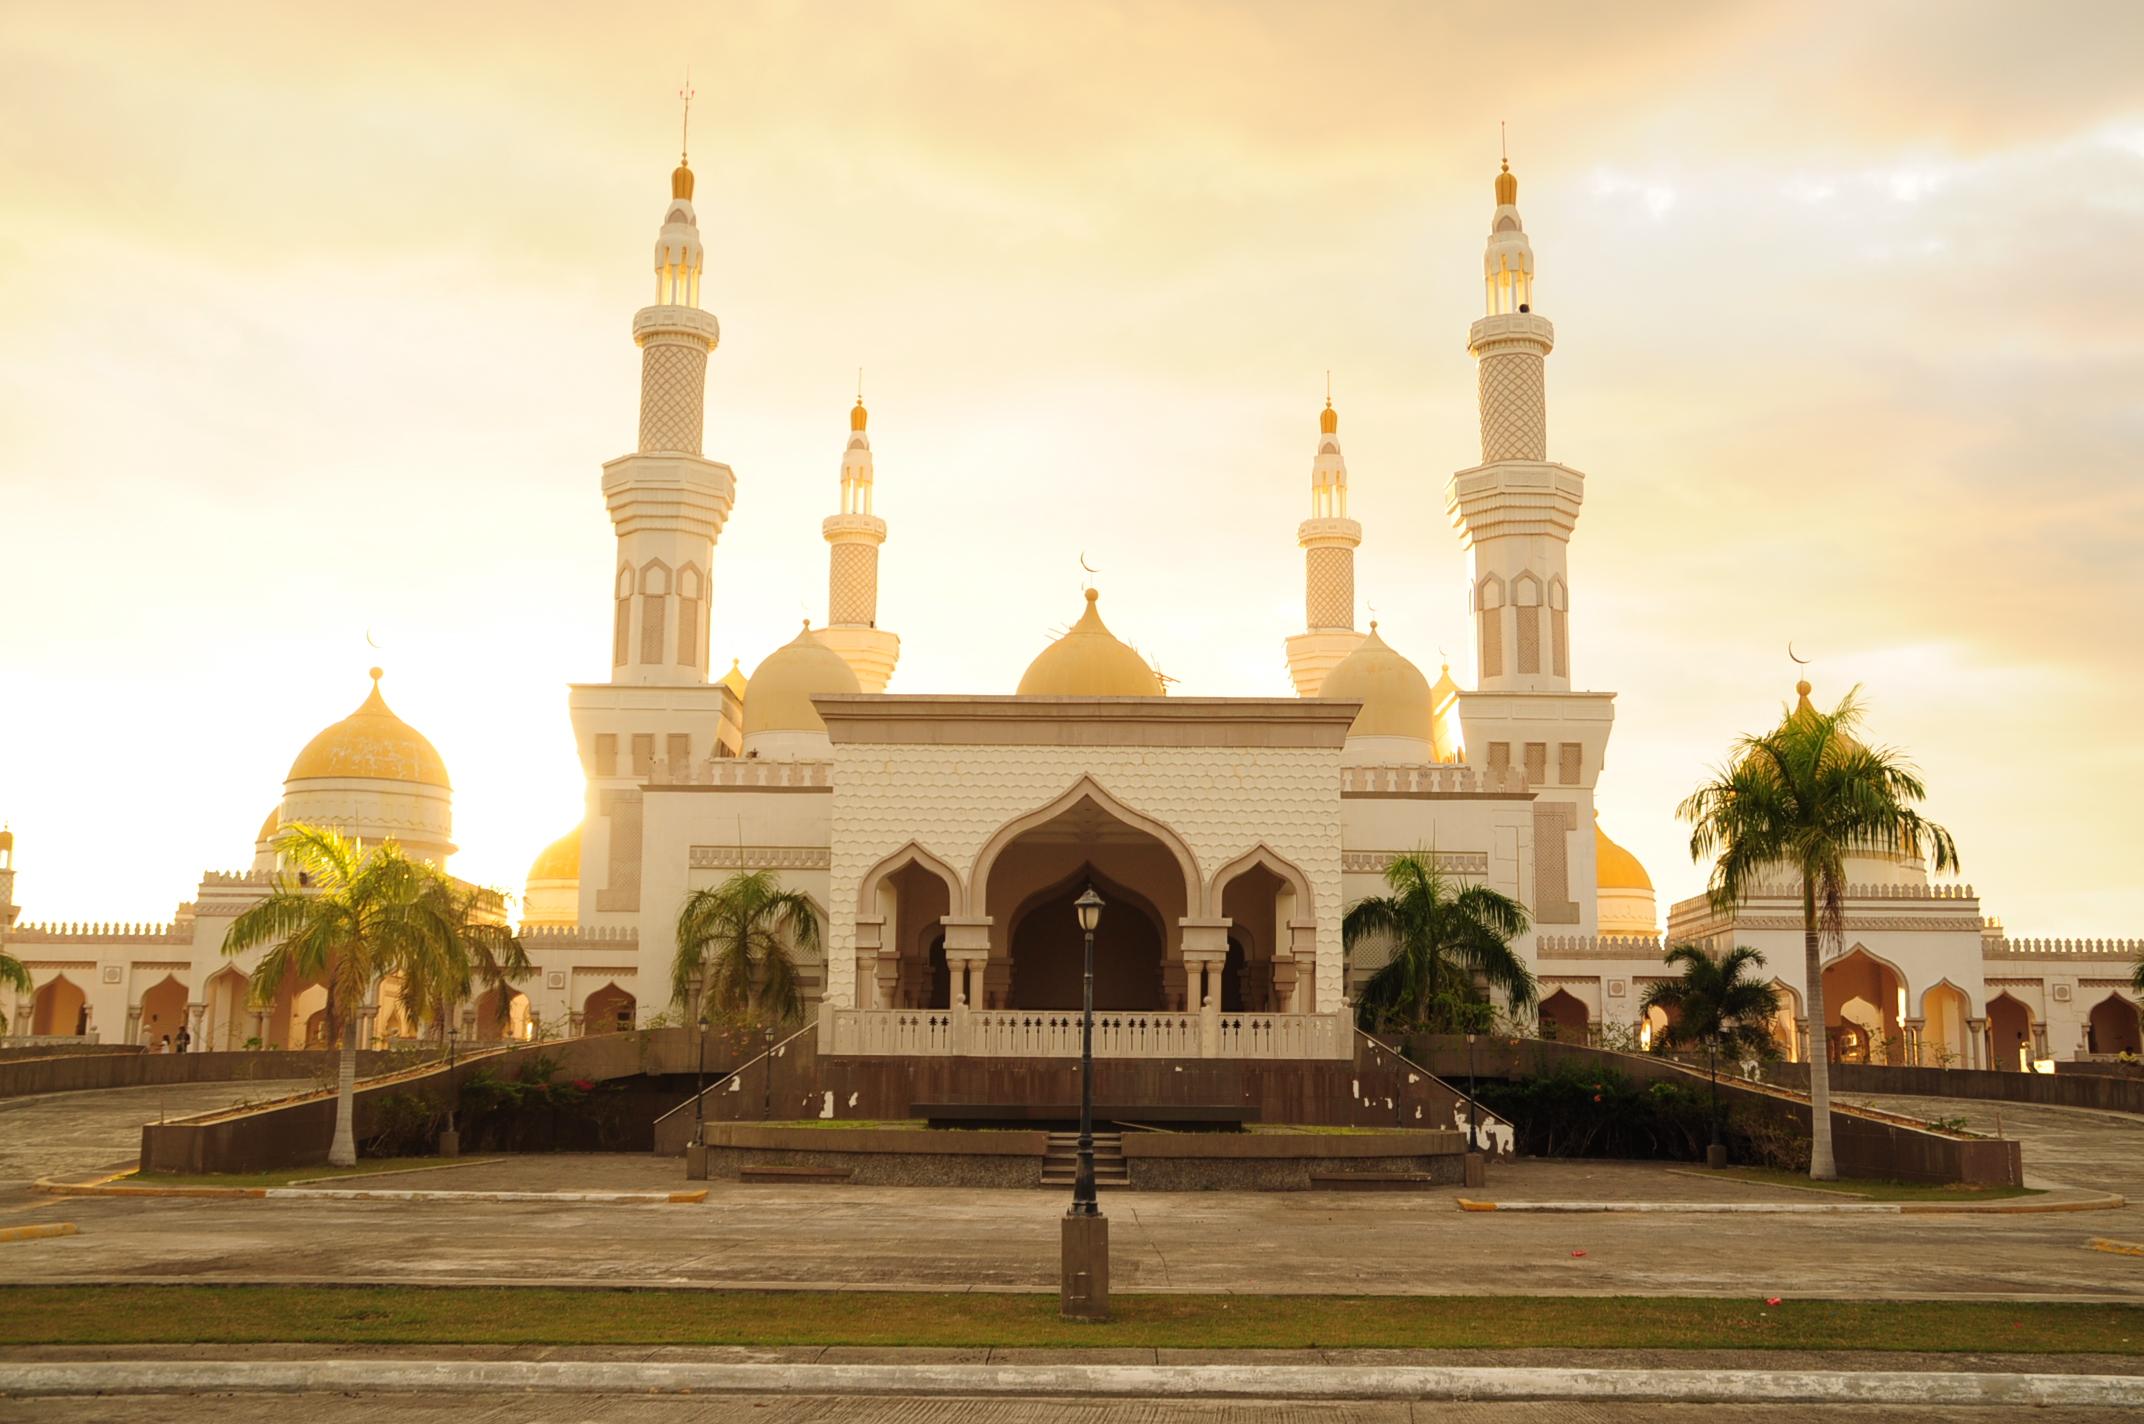 Sultan Hassanal Bolkiah Mosque, Cotabato CitySultan Hassanal Bolkiah Mosque, Cotabato City